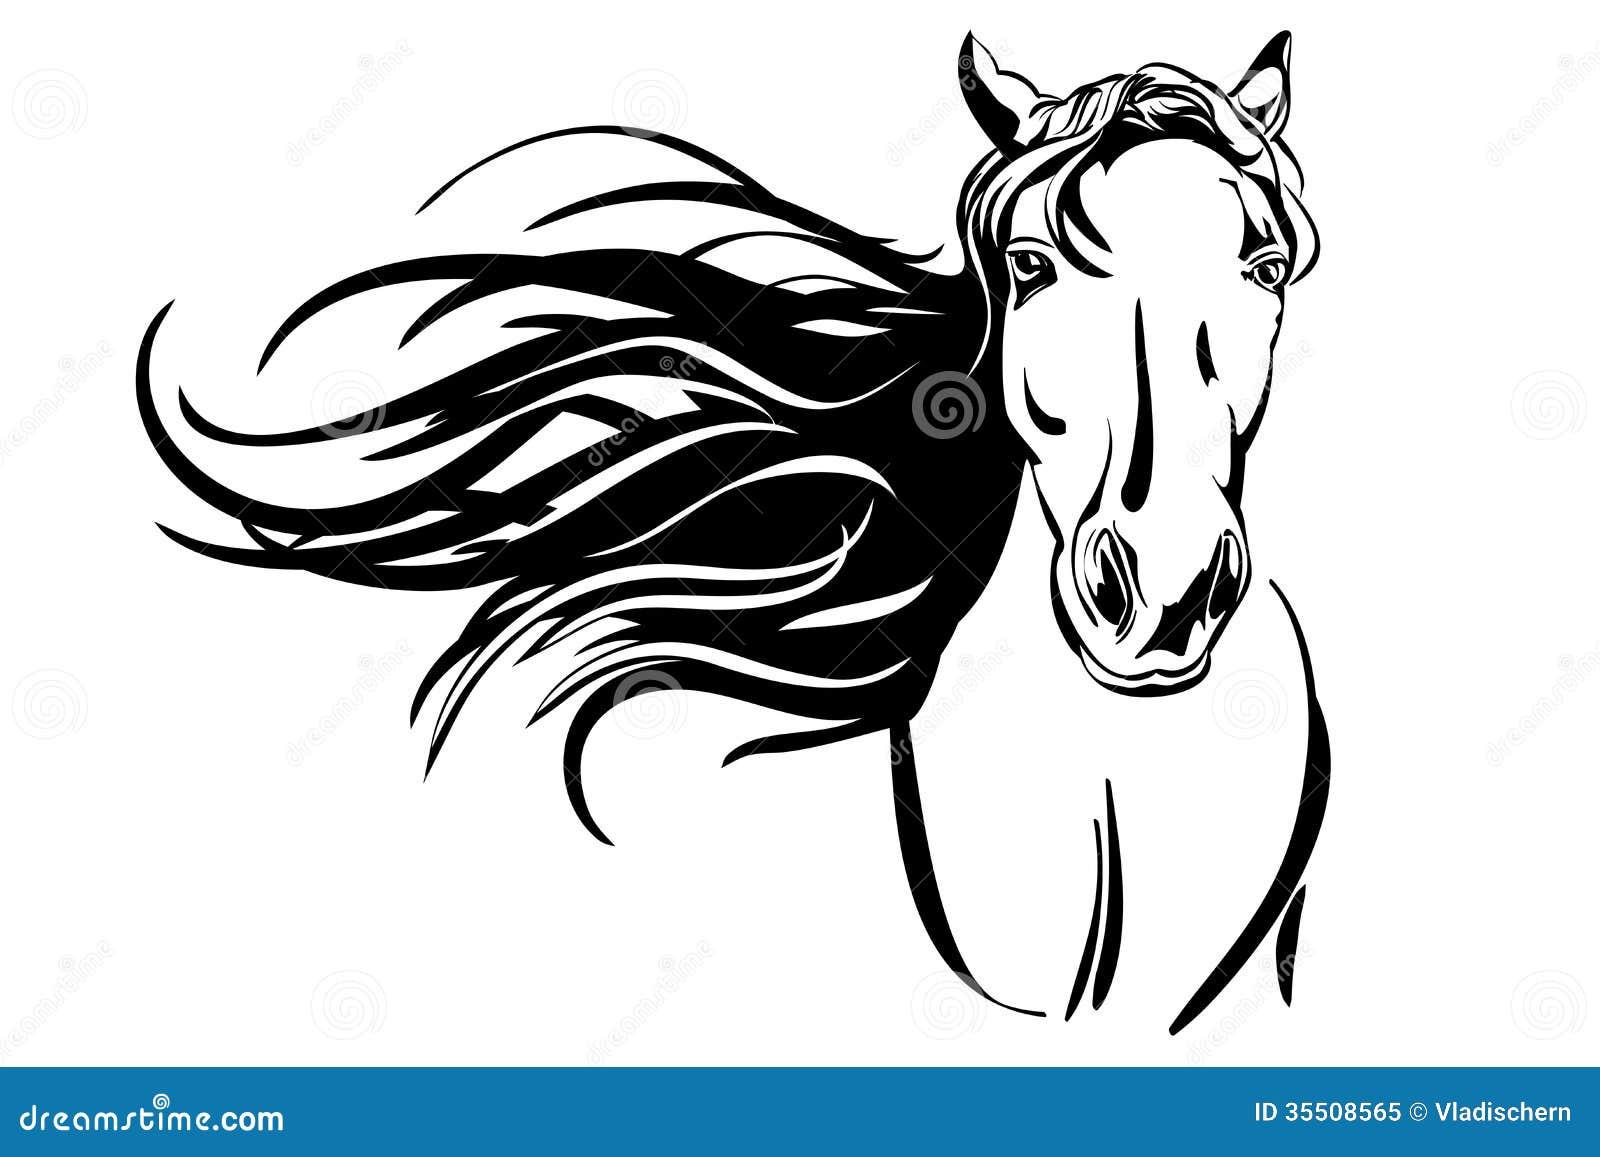 horse hand drawn vector llustration royalty free stock